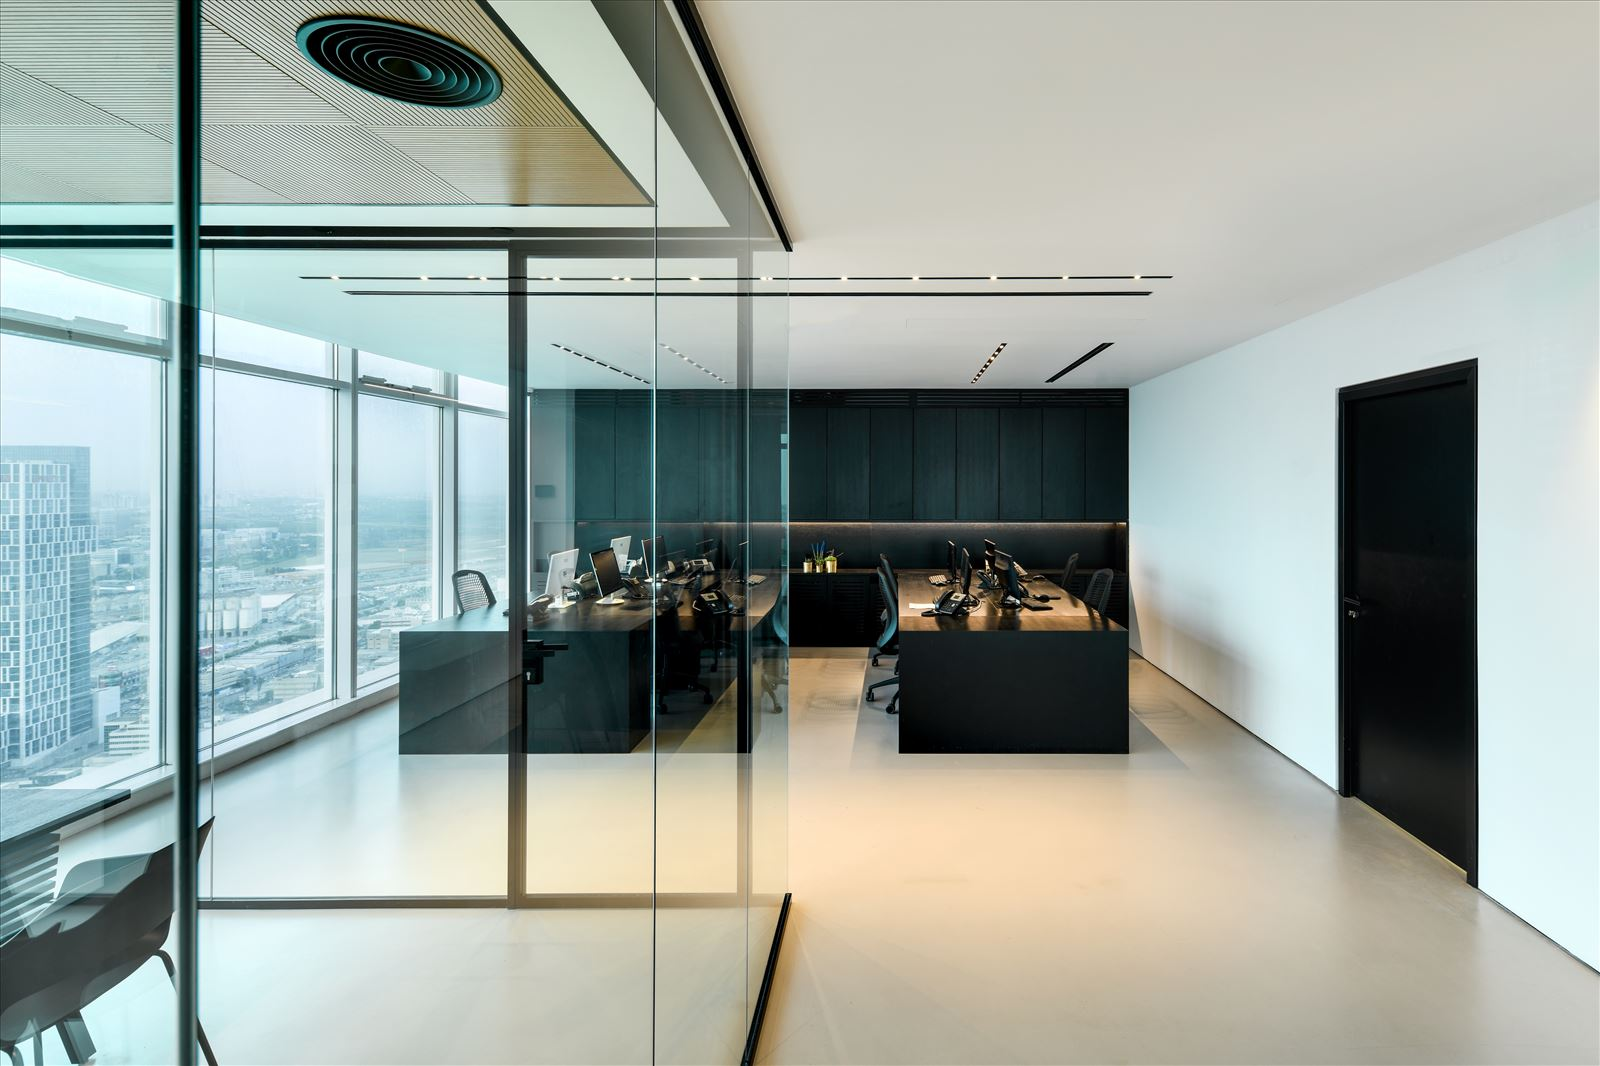 Divident office שטח המשרד מואר במגוון גופי תאורה בתכנון קמחי תאורה